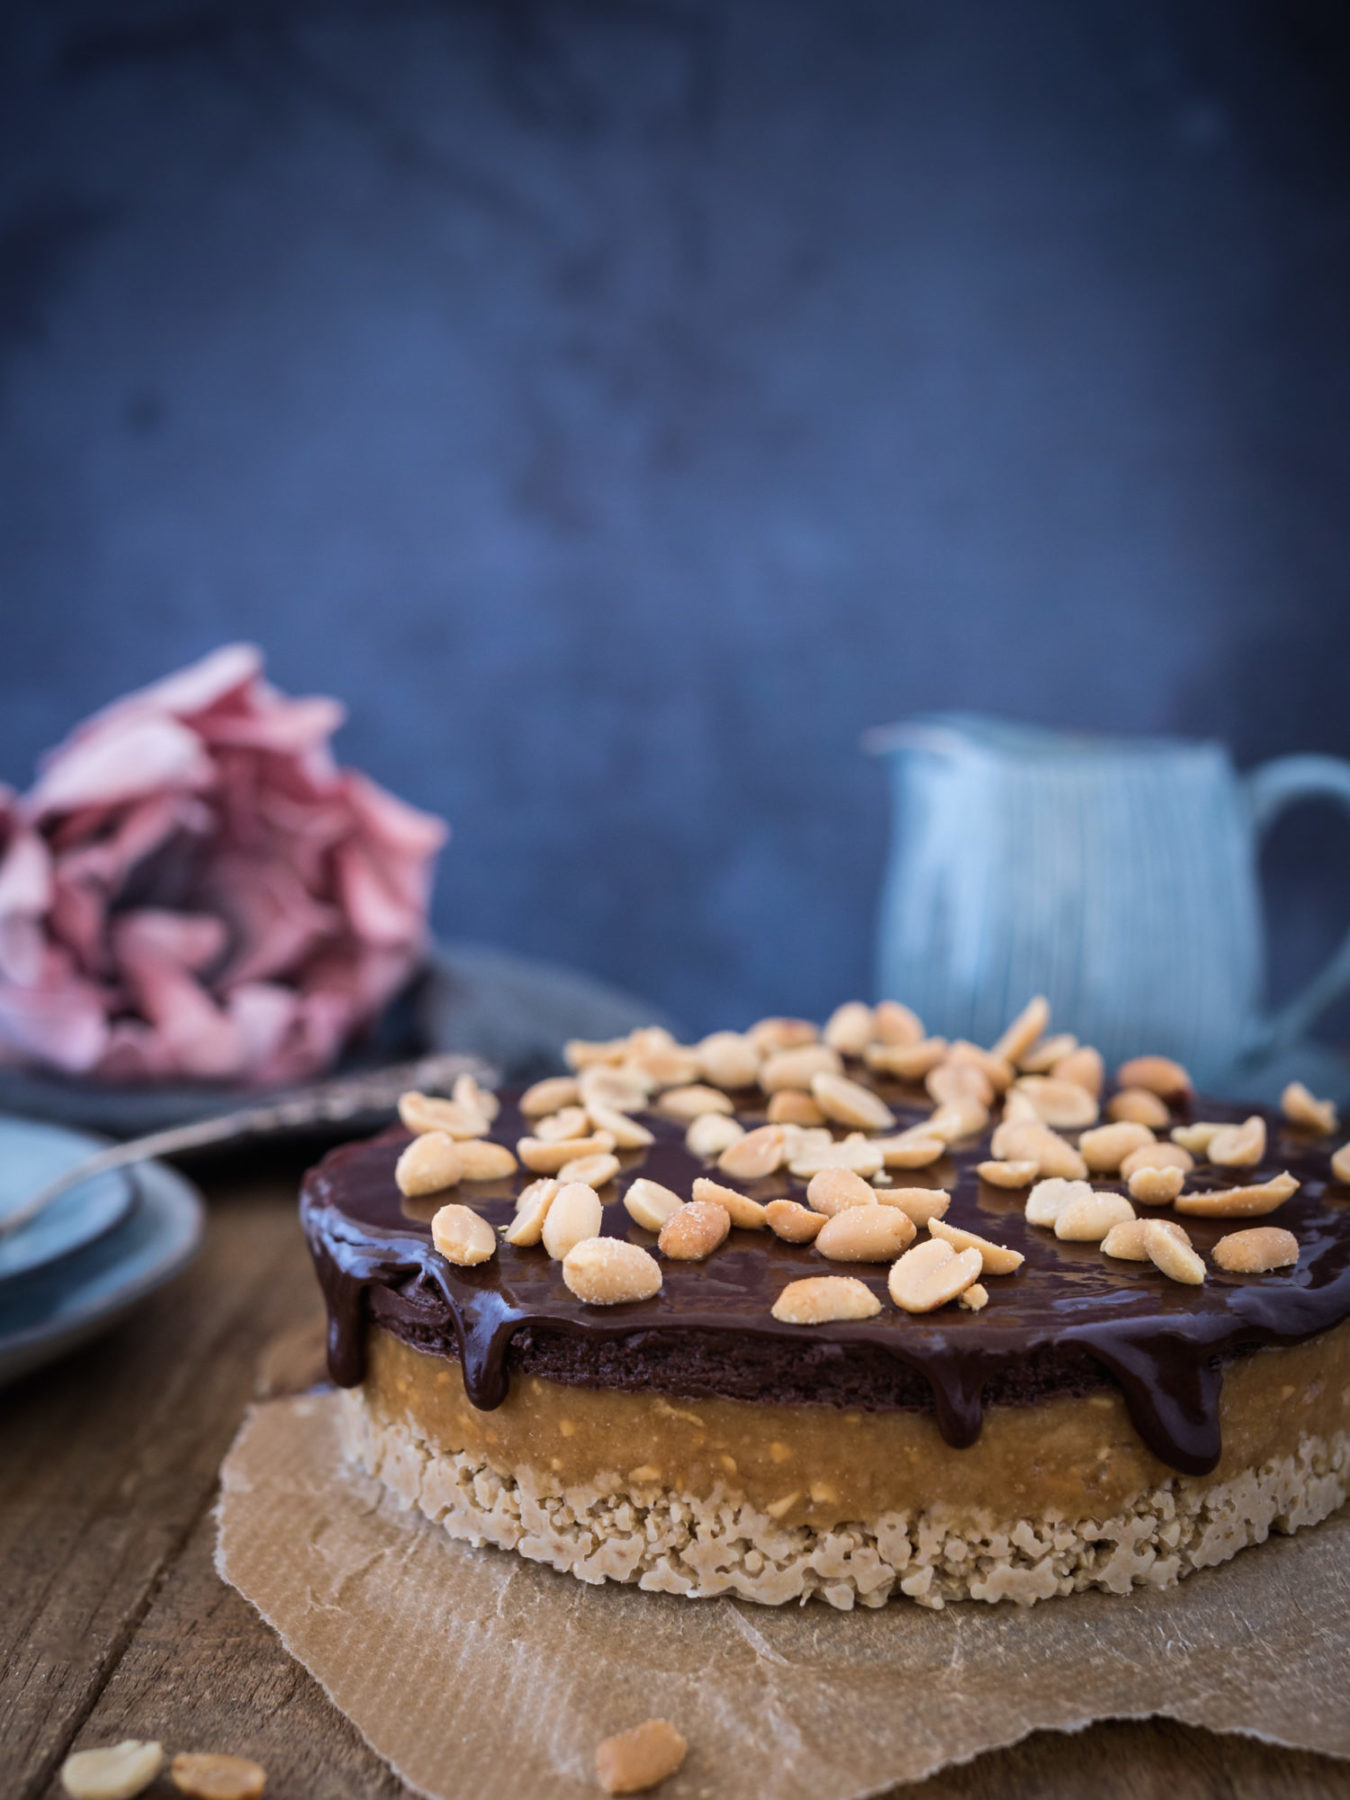 Erdnussbutter Schokoladen Torte mit frischkäse vegan, optional Glutenfrei